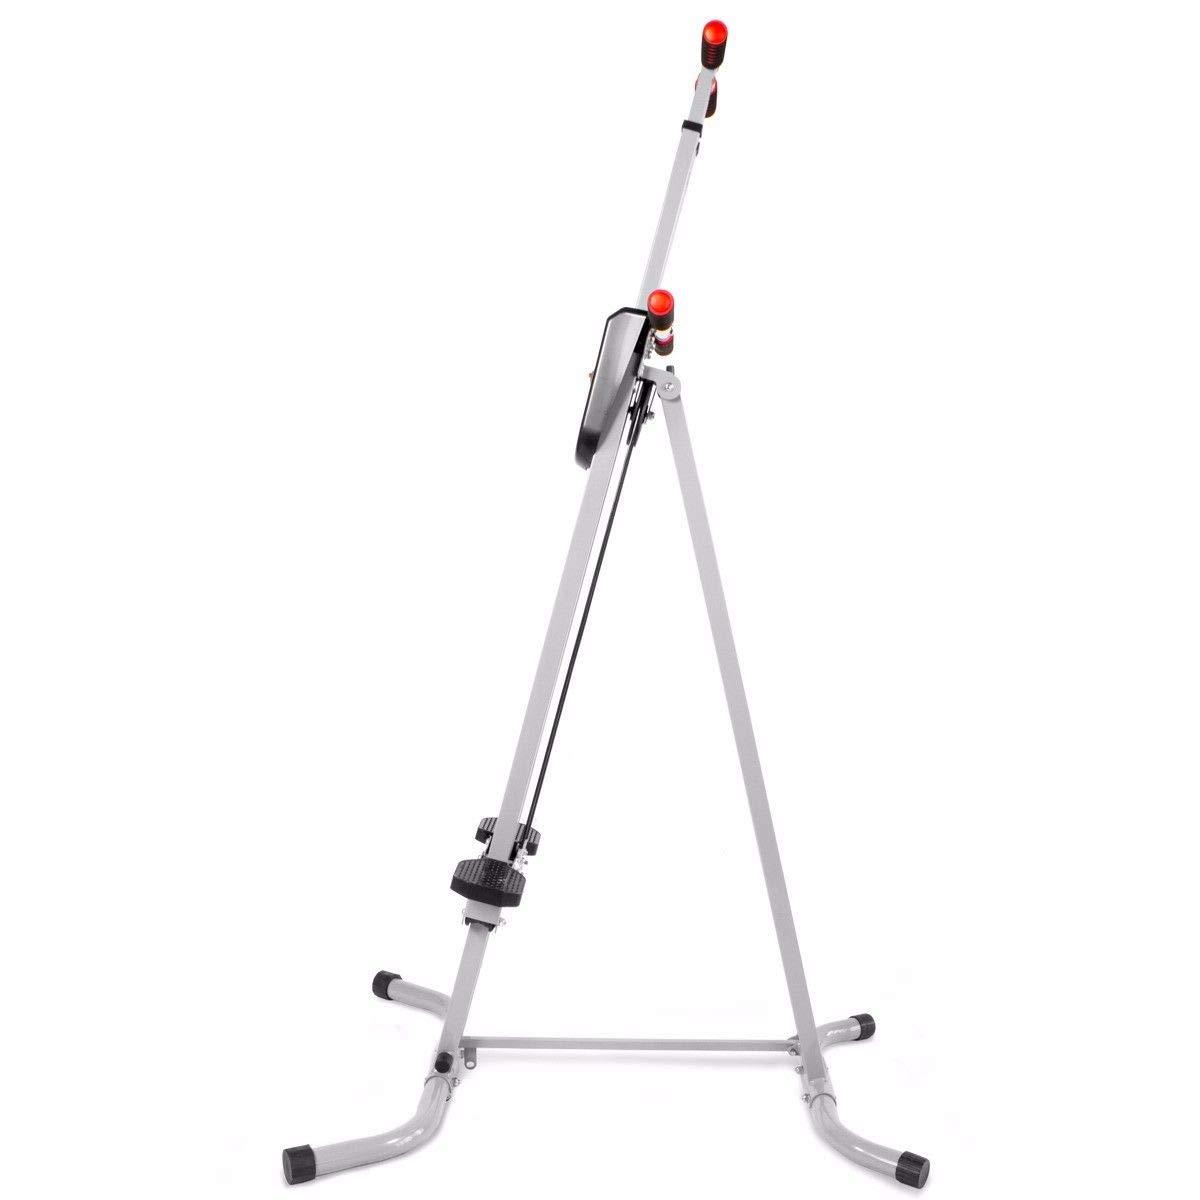 XtremepowerUS Vertical Climber Fitness Cardio Exercise Machine by XtremepowerUS (Image #5)